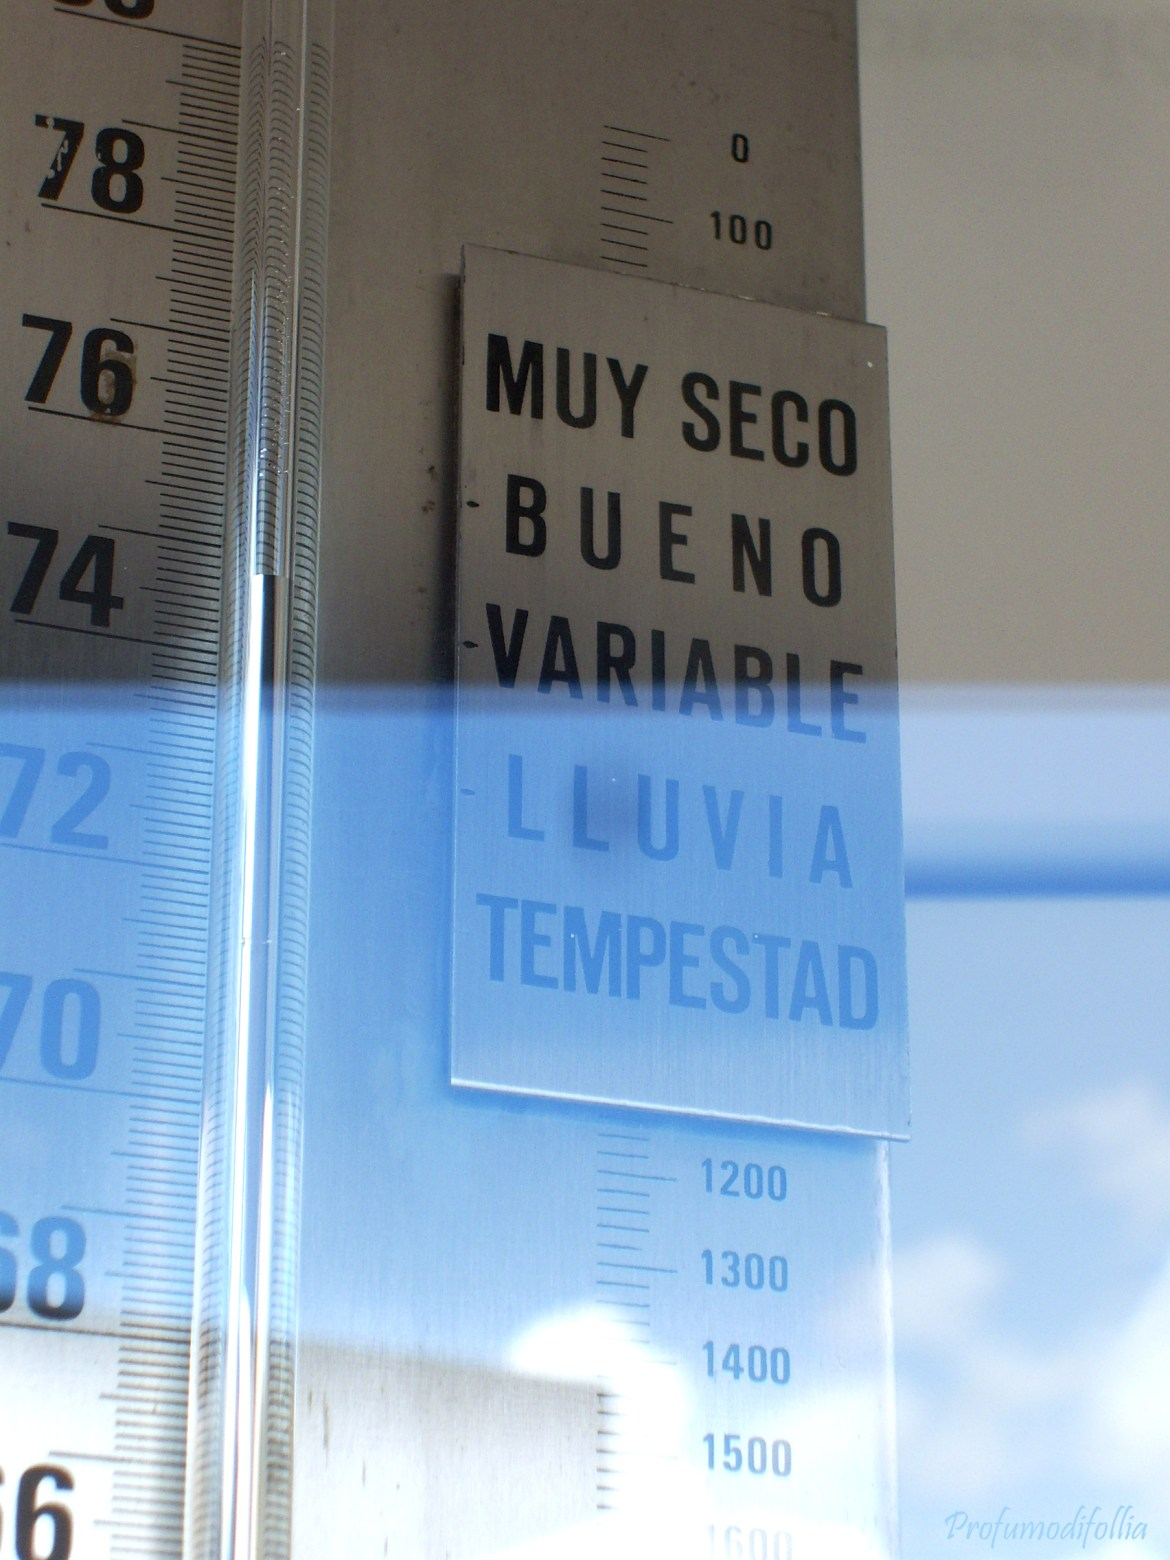 Stazione meteorologica del CosmoCaixa